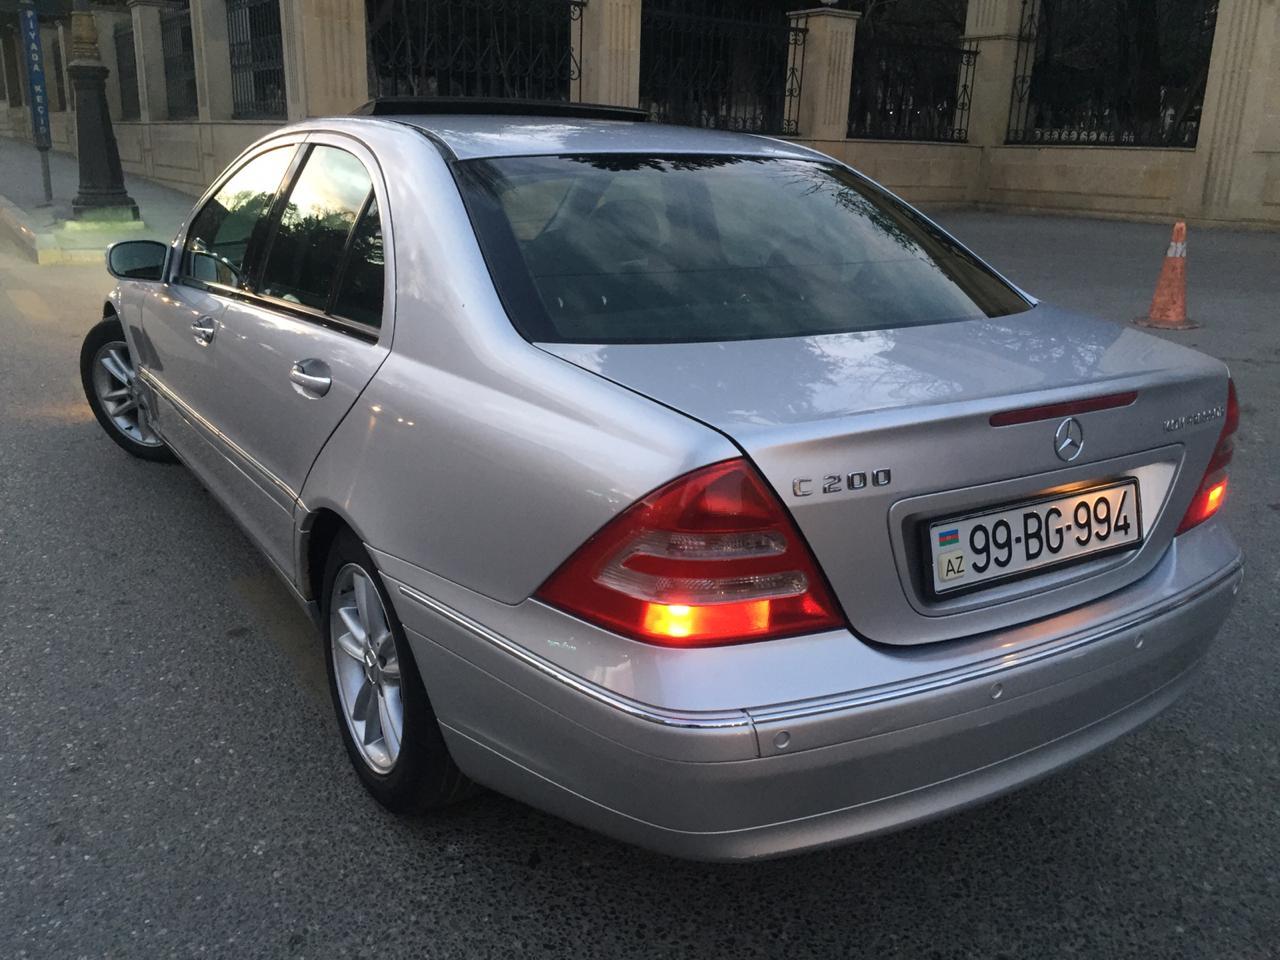 Mercedes-Benz C 200 2.0(lt) 2000 Second hand  $12000